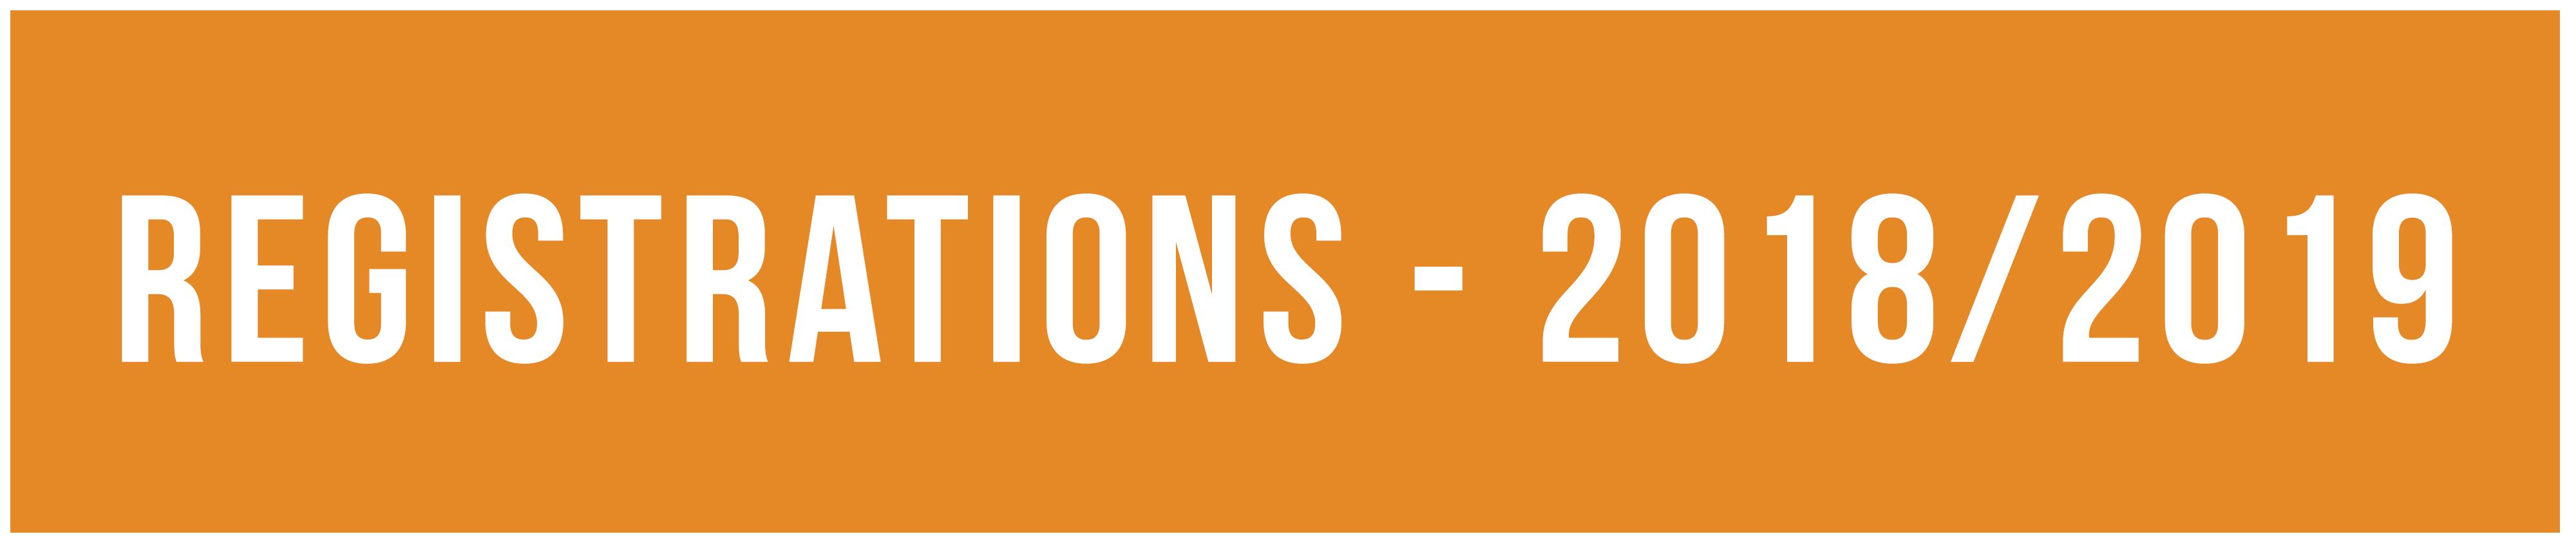 Admissions - 2018/2019